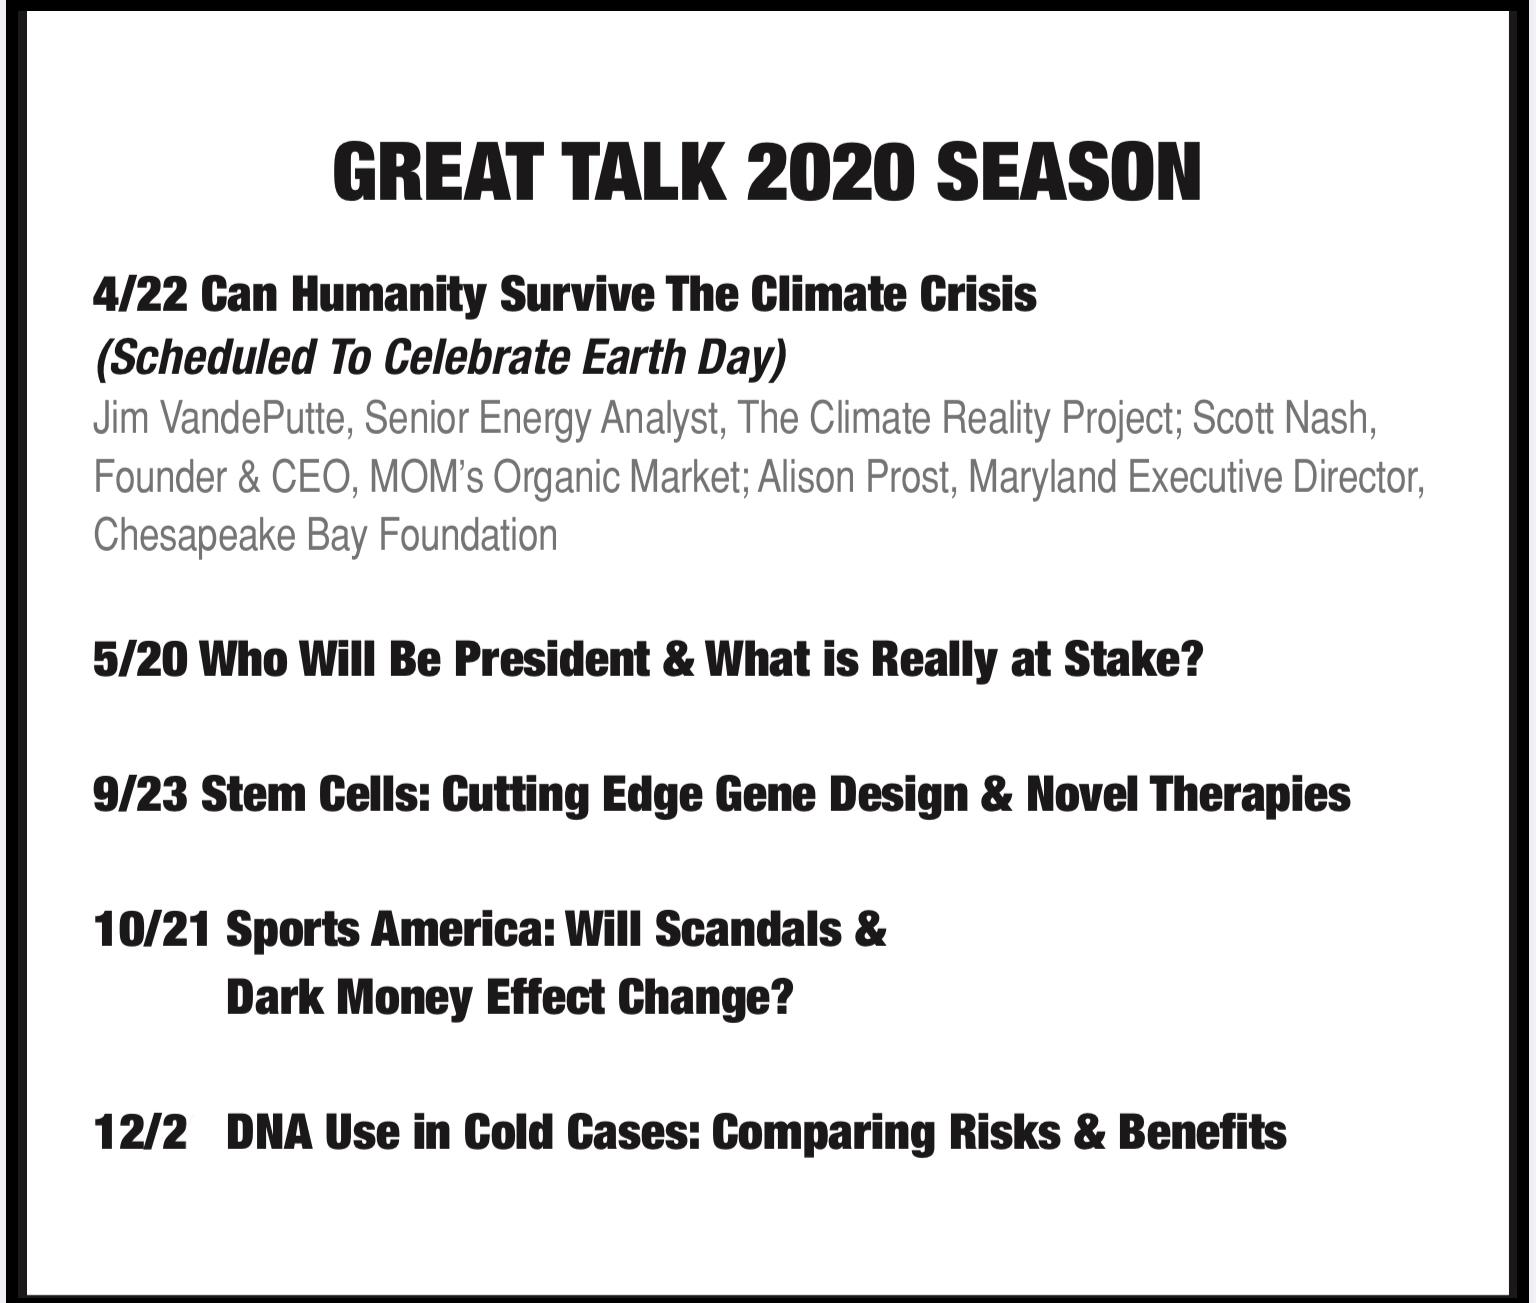 Schedule 2020 image